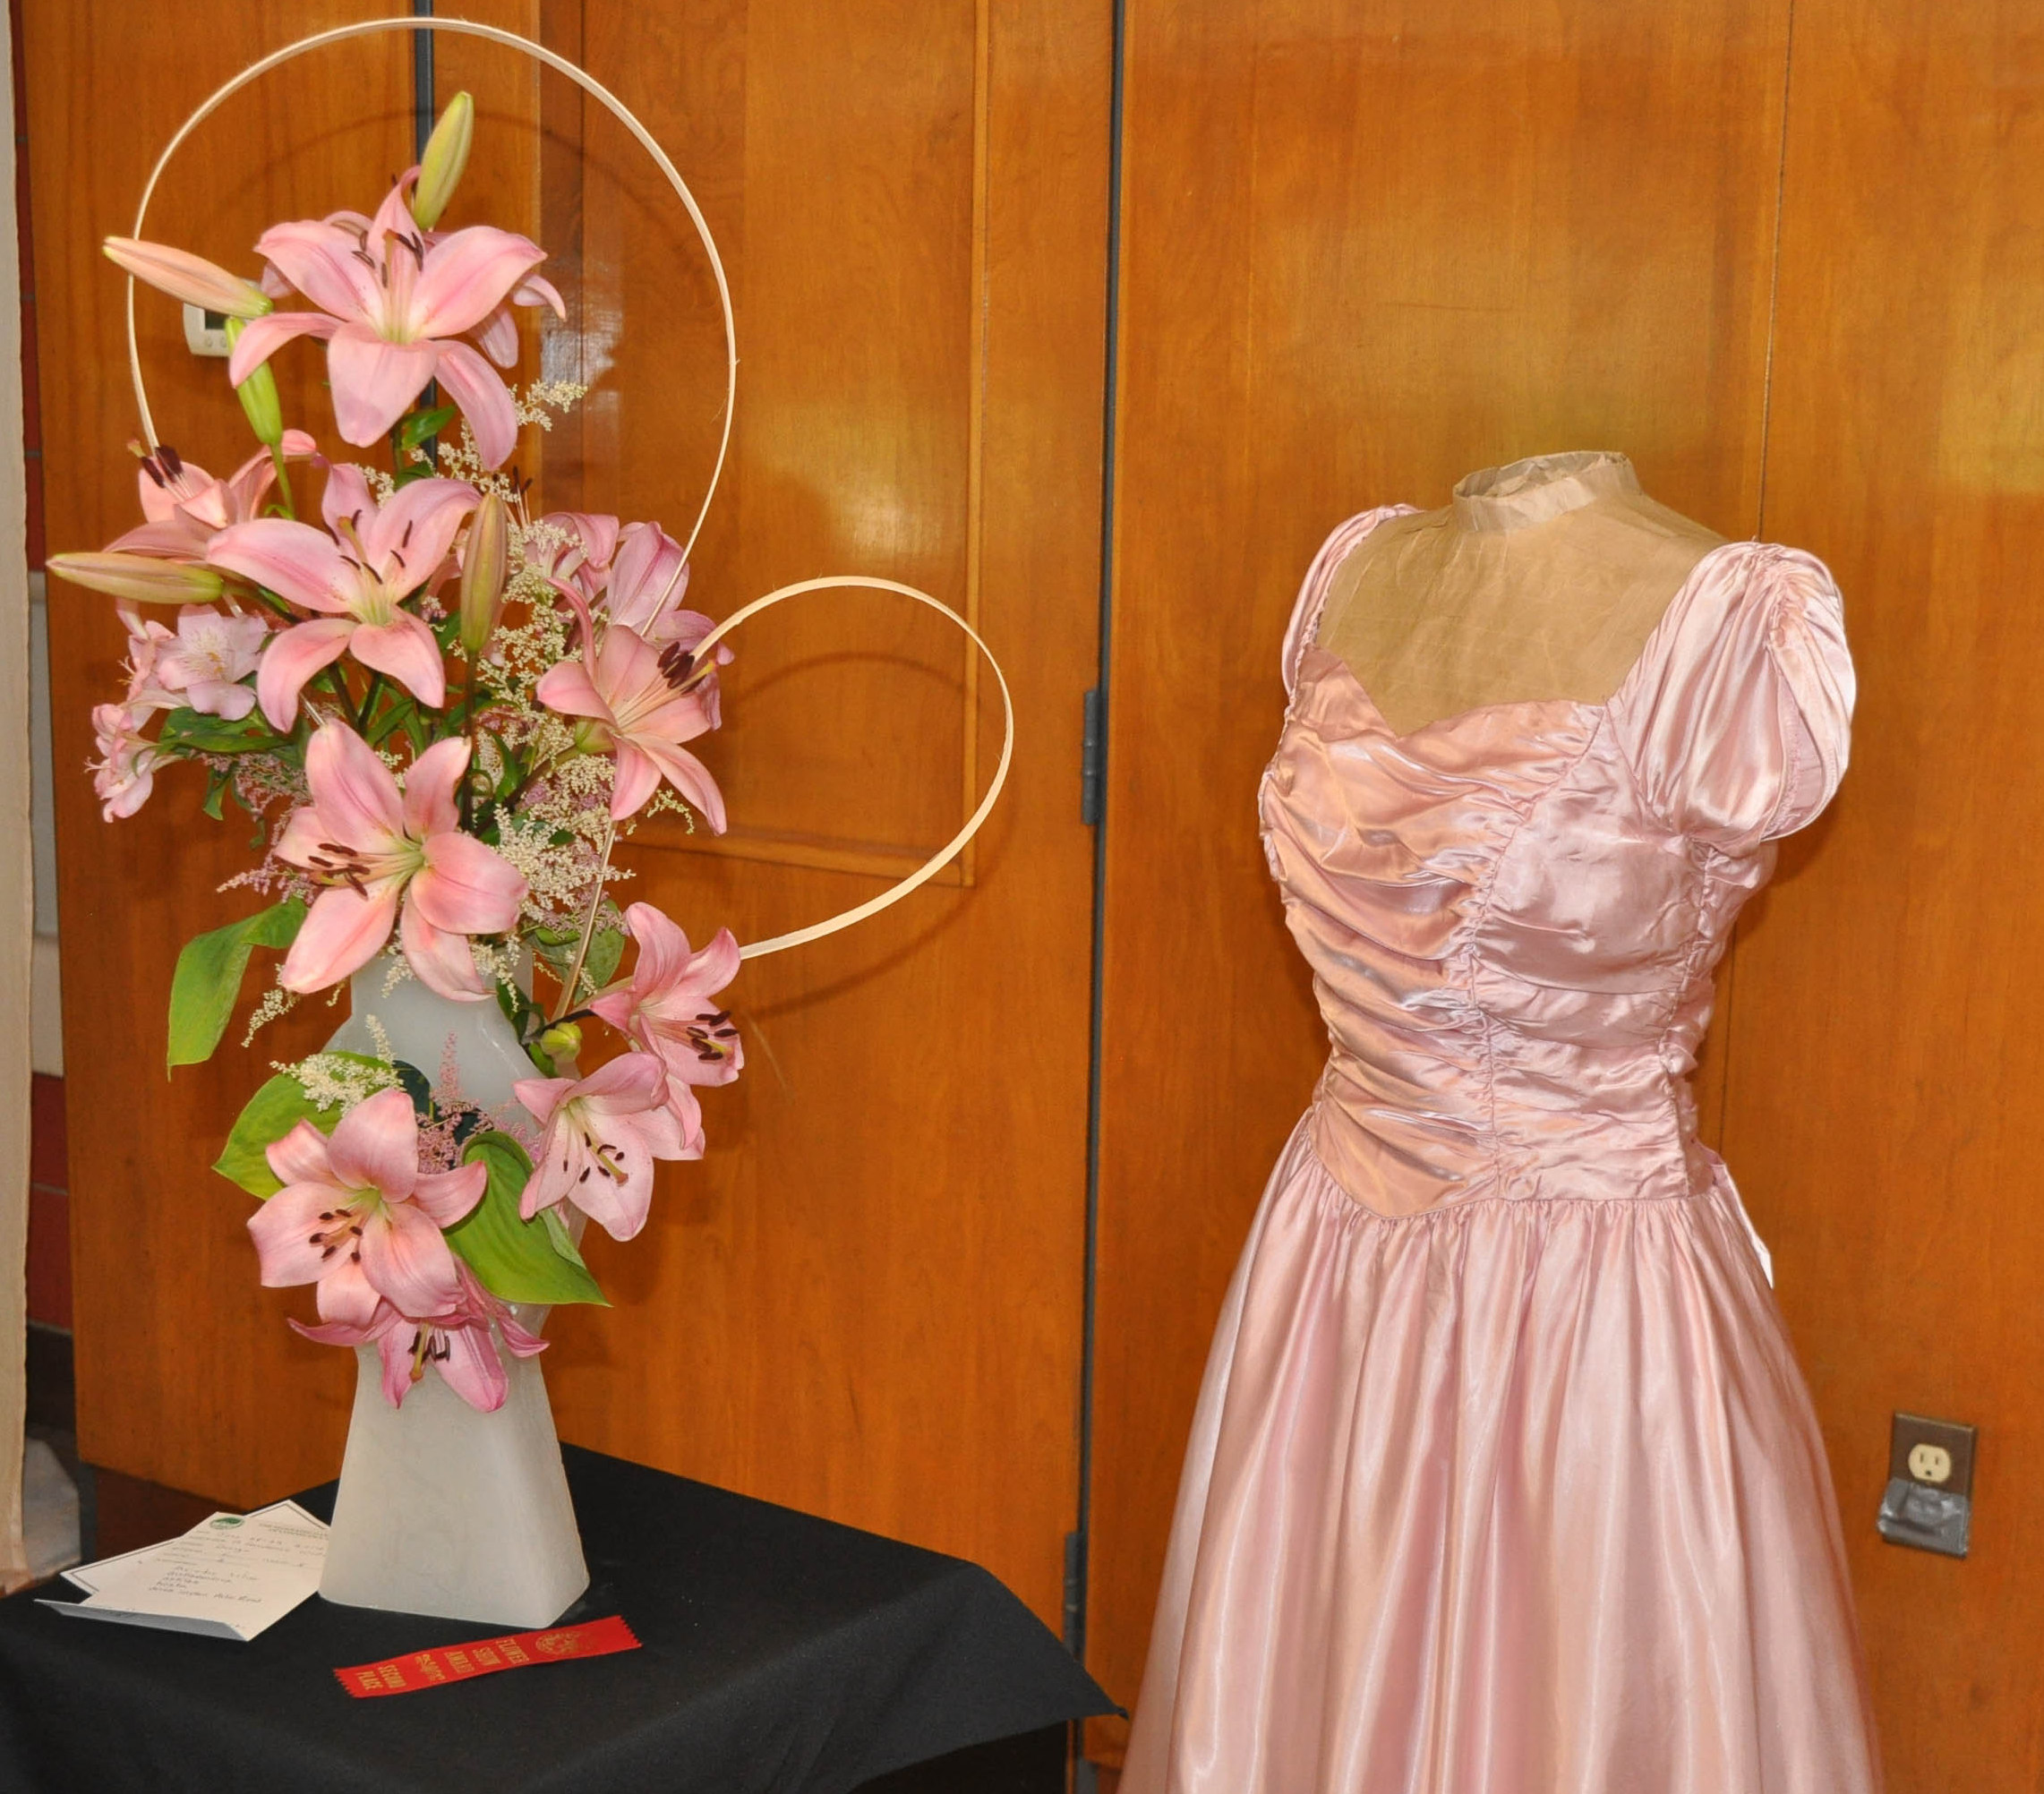 6arrangement and wedding gown2 cr.jpg